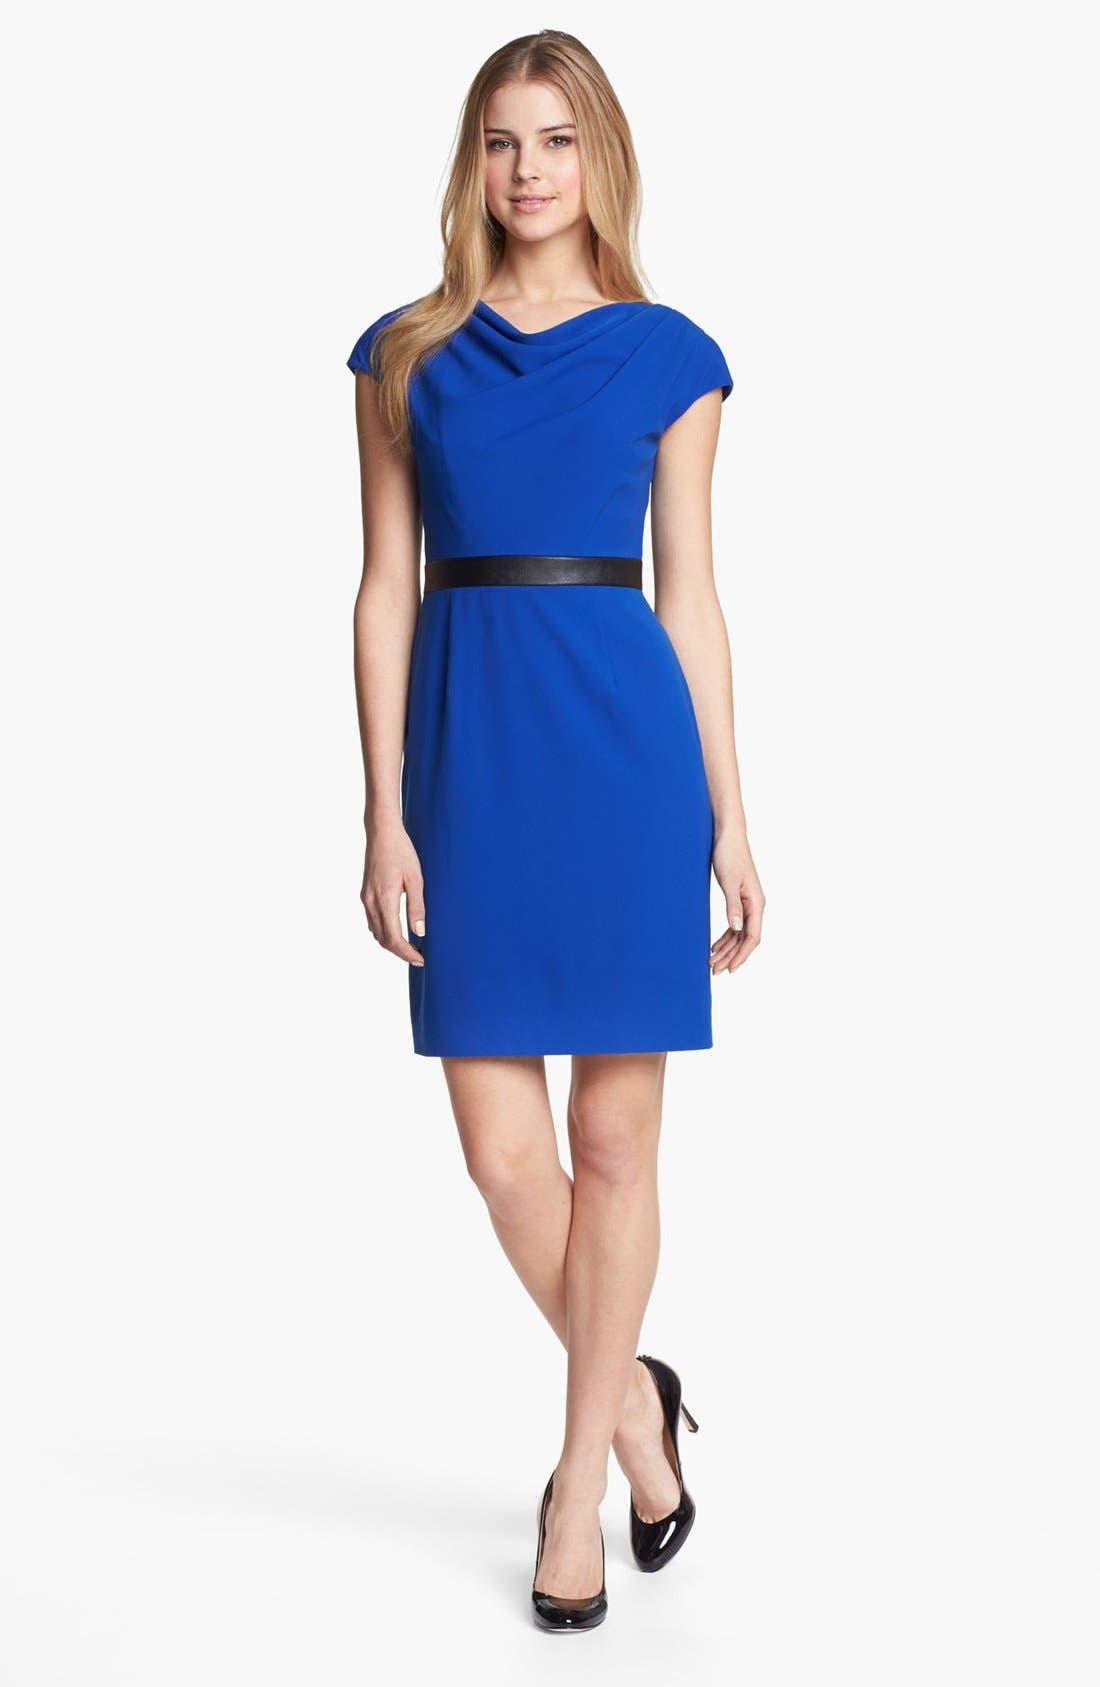 Alternate Image 1 Selected - Adrianna Papell Drape Neck Dress (Regular & Petite) (Online Only)